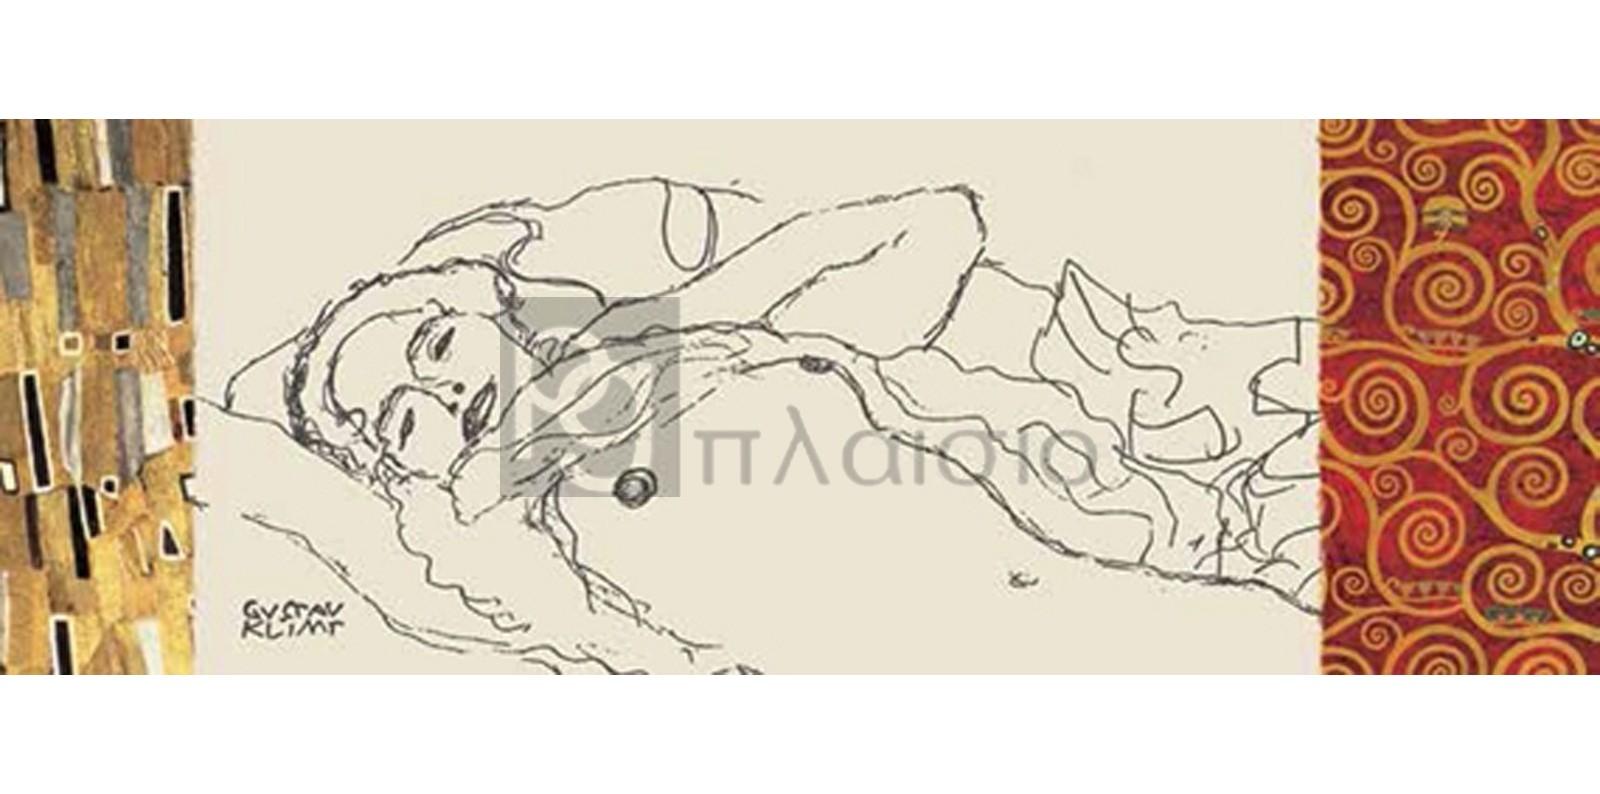 Gustav Klimt - Deco Woman I